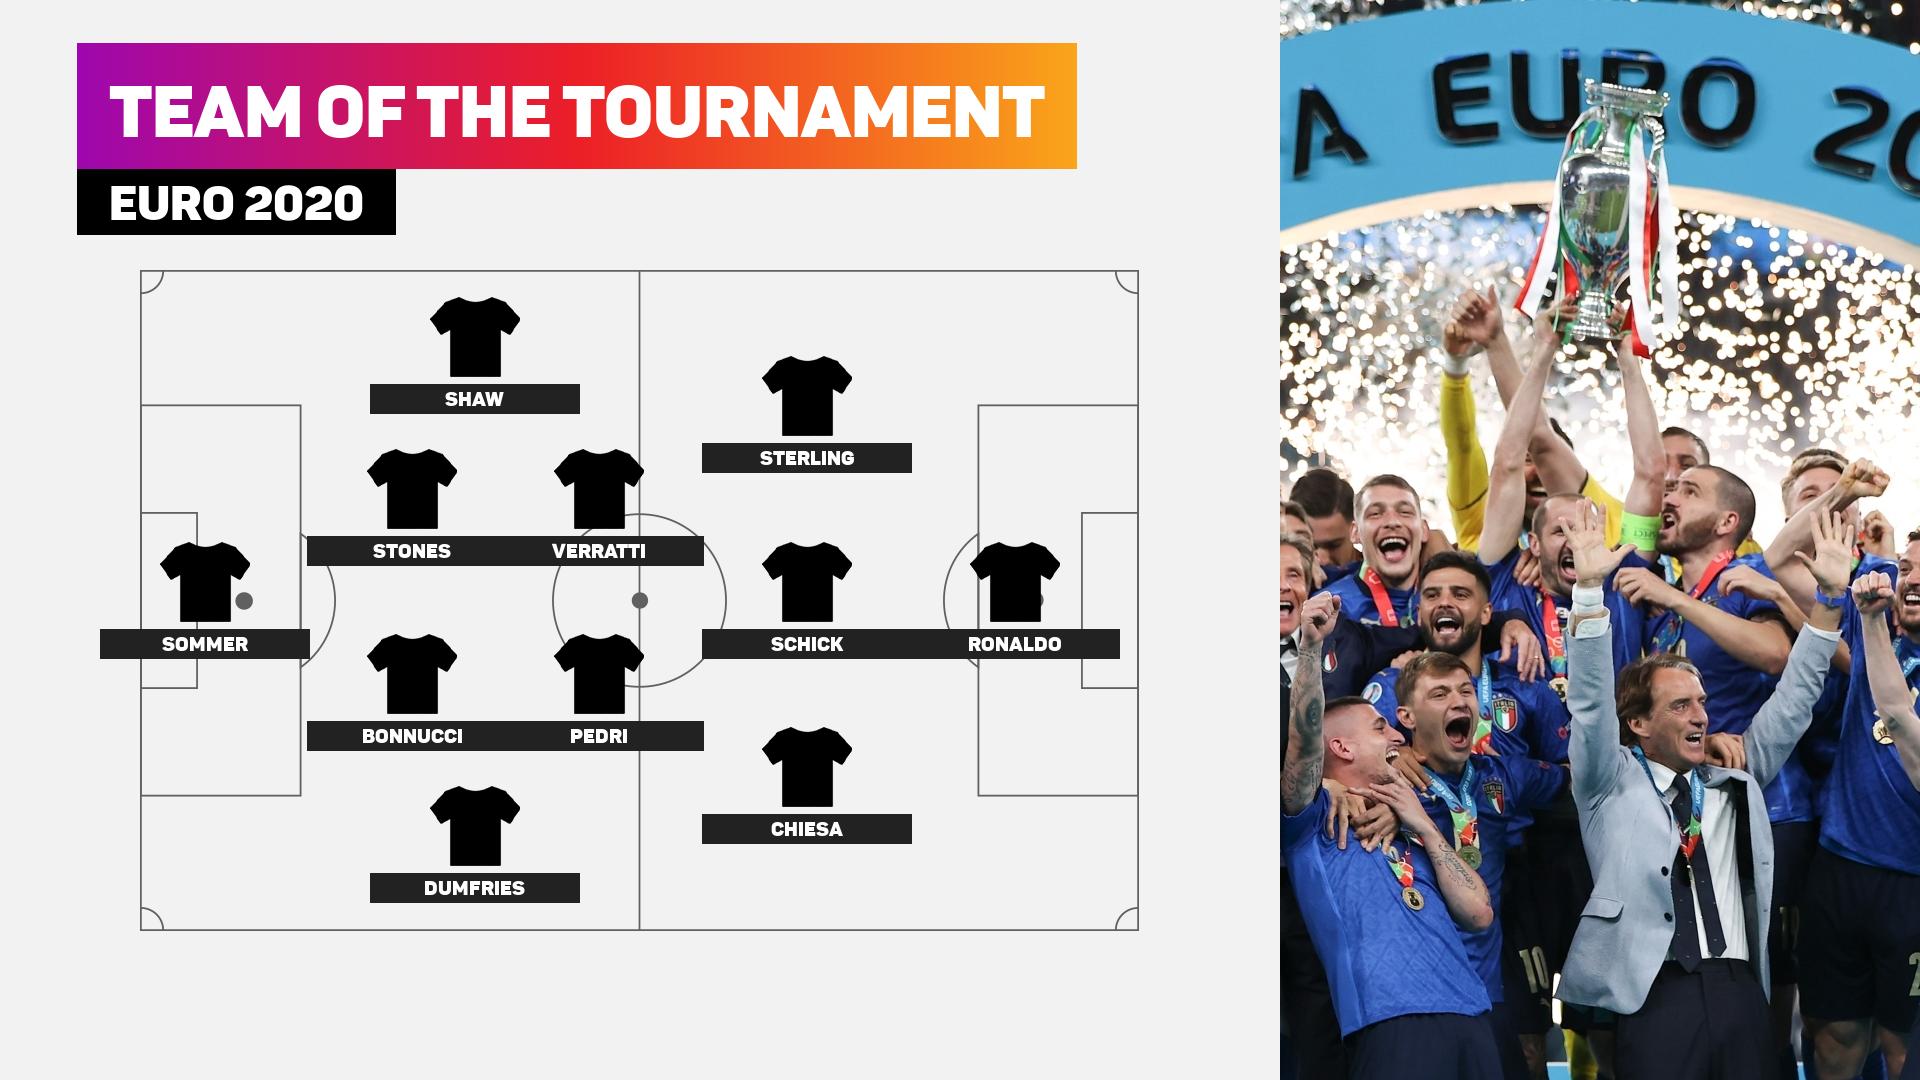 Euro 2020 Team of the Tournament